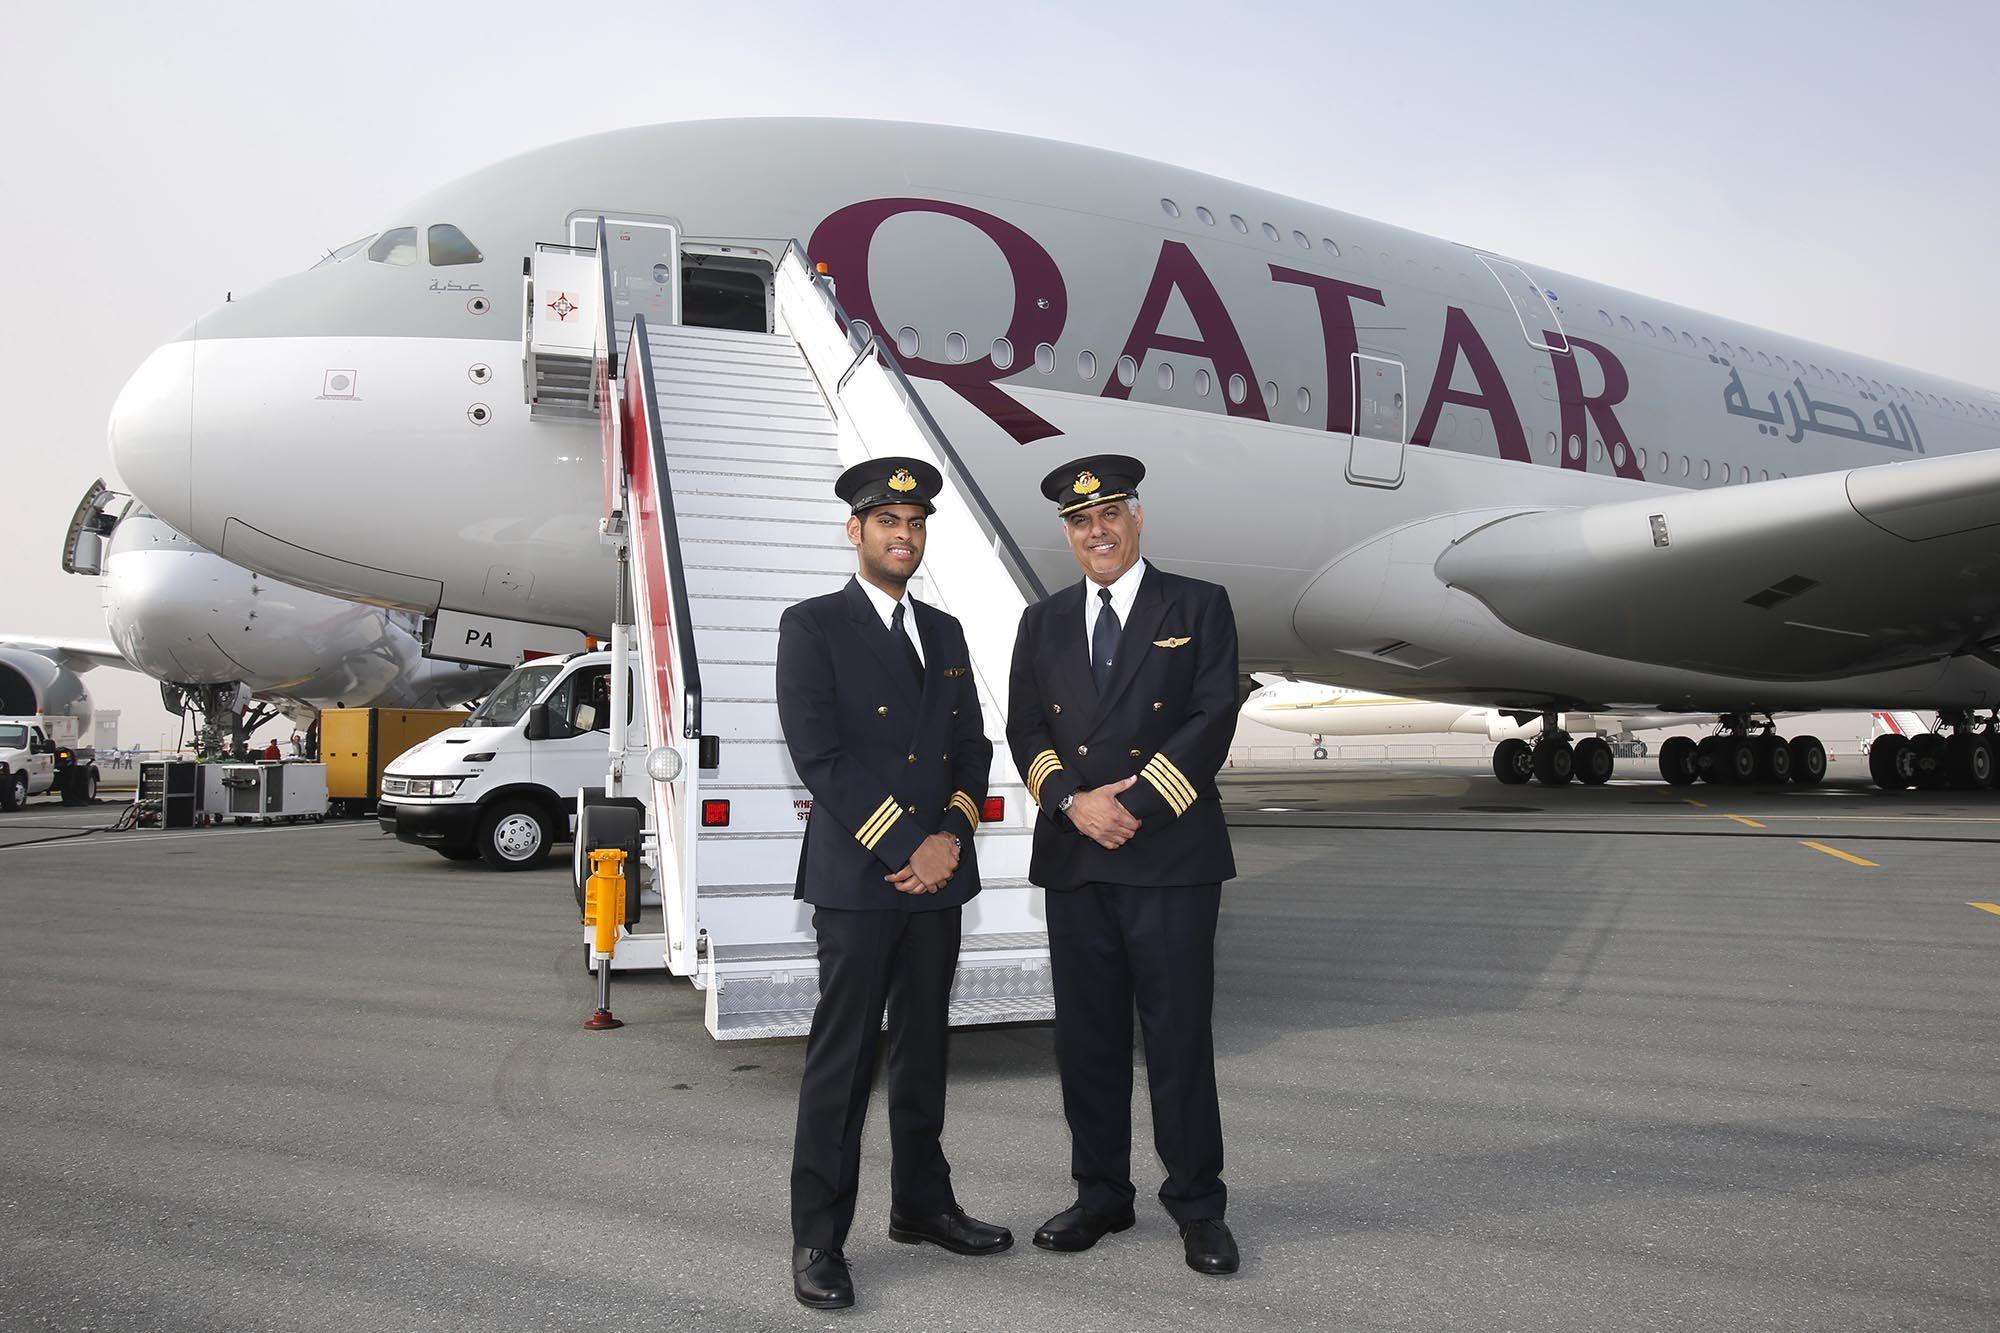 Qatar airways pilot recruitment road show in istanbul havayolu 101 qatar airways pilot recruitment road show in istanbul havayolu 101 stopboris Images